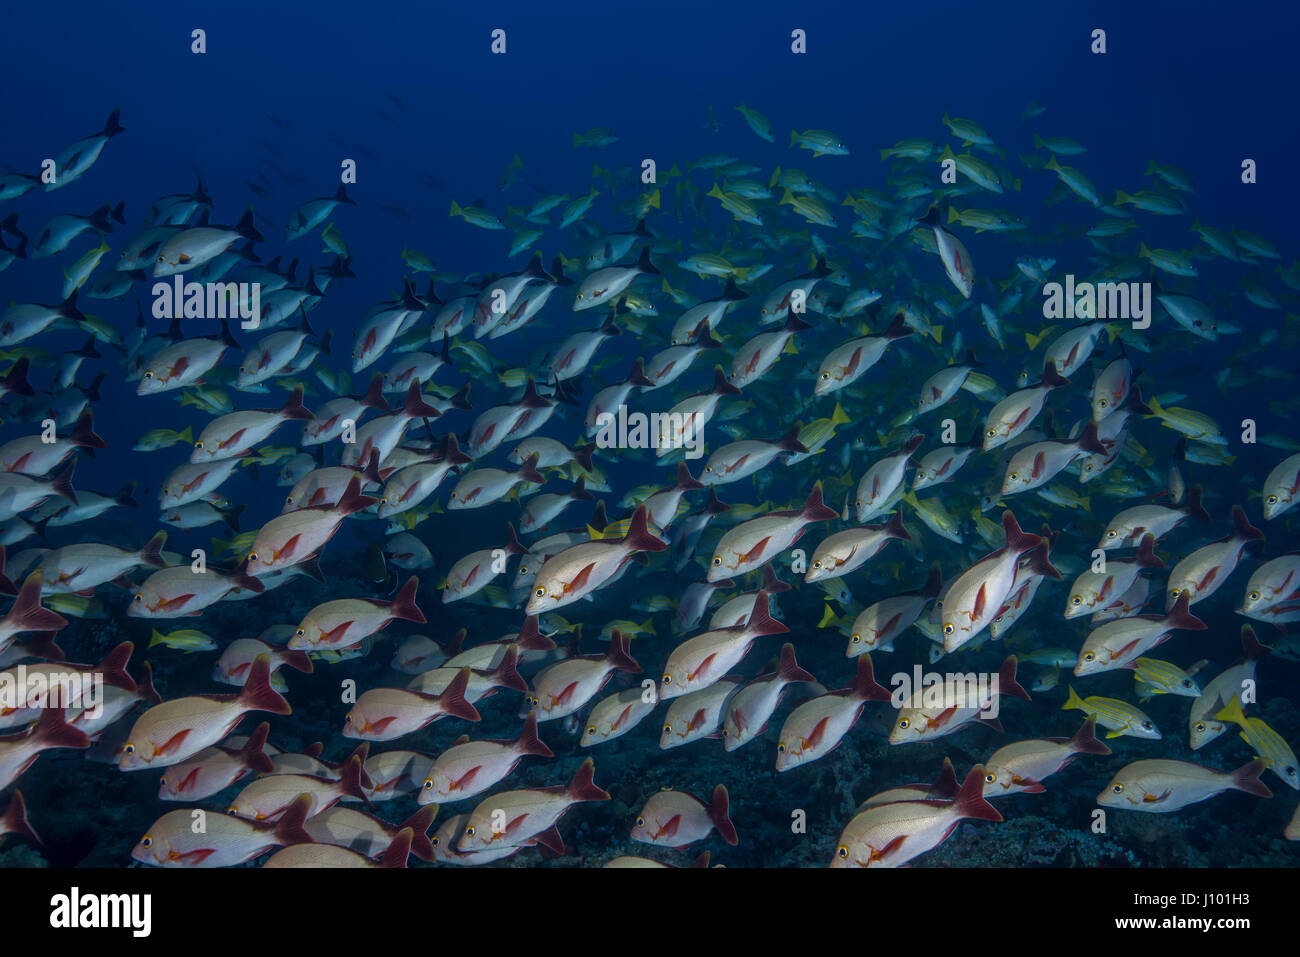 of fish humpback red snapper lutjanus gibbus in blue